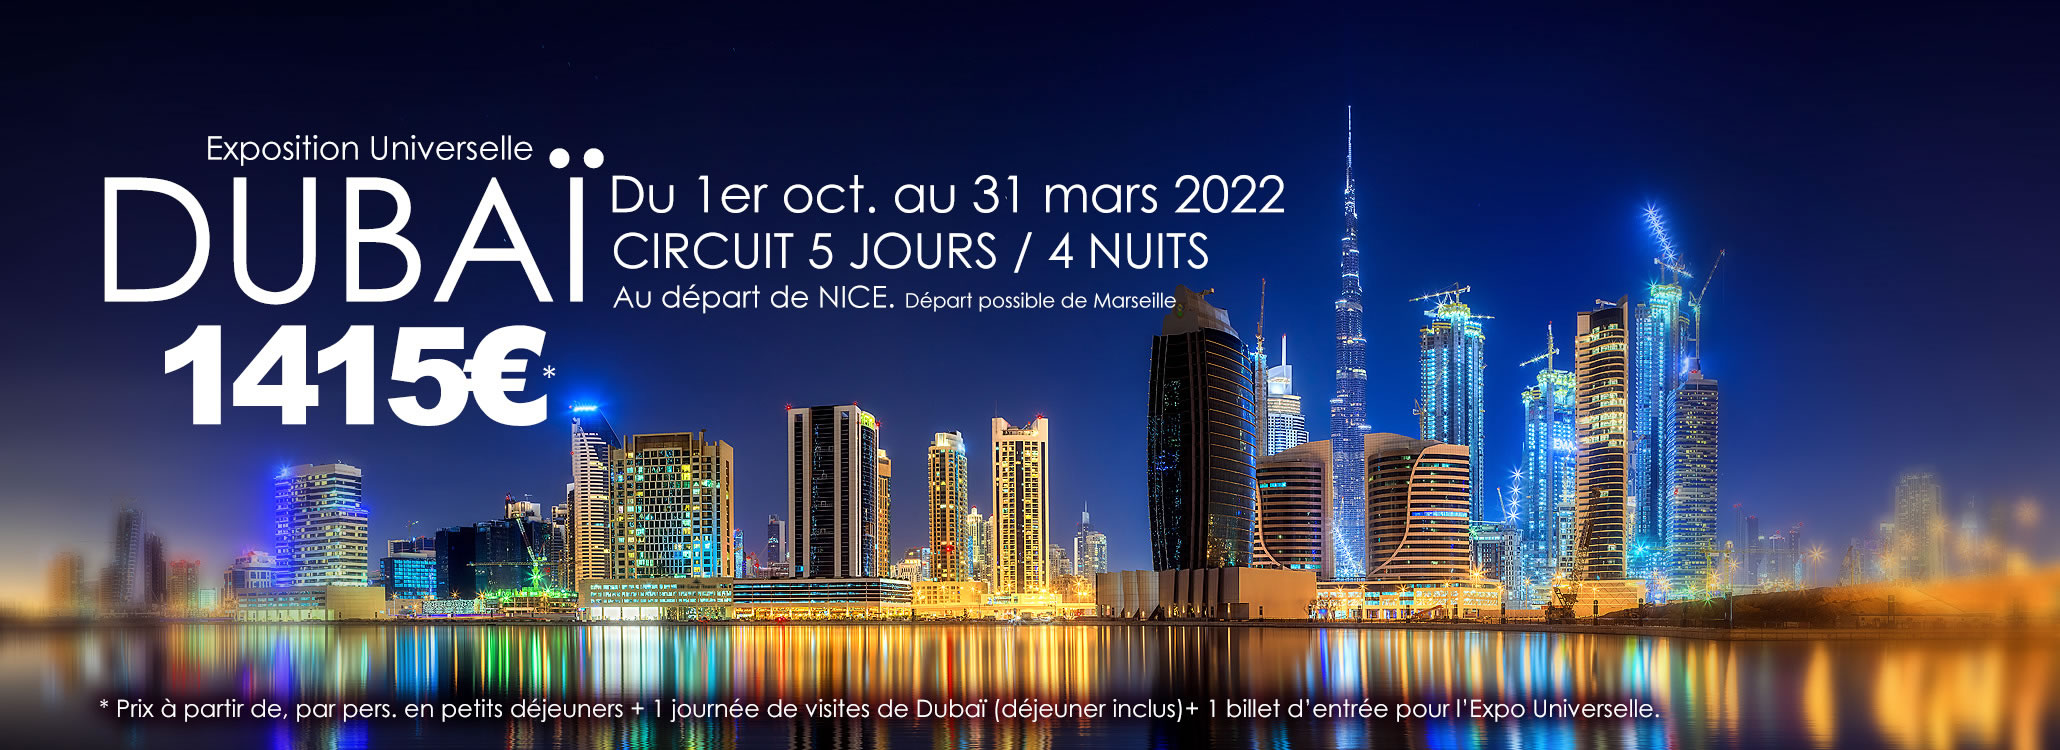 DUBAI_09-2021-2022_VG_D